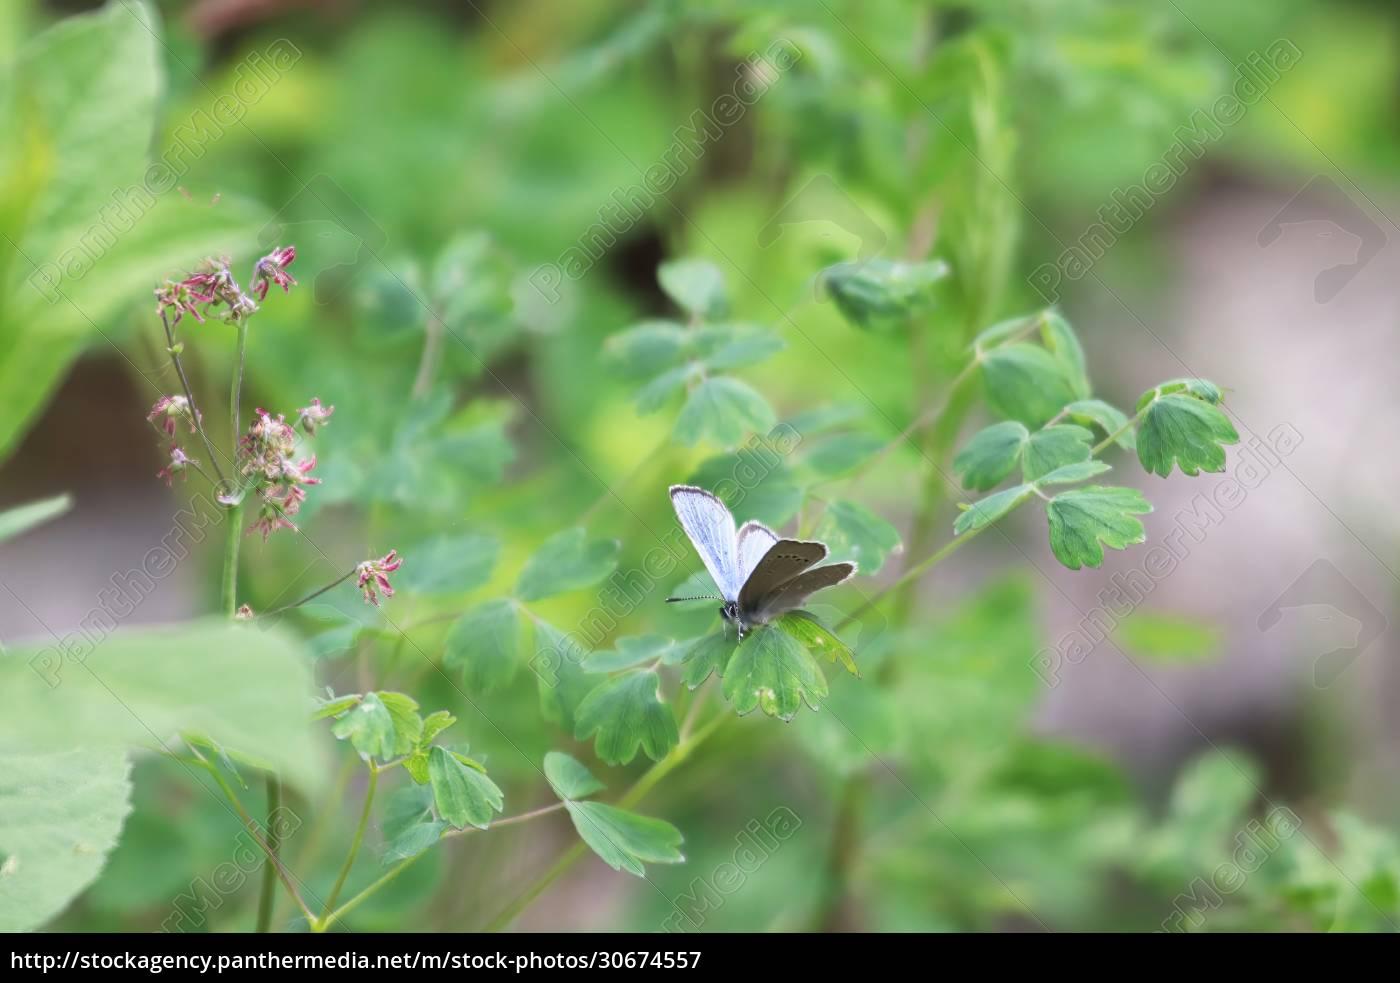 a, silvery, blue, gossamer, butterfly, sitting - 30674557